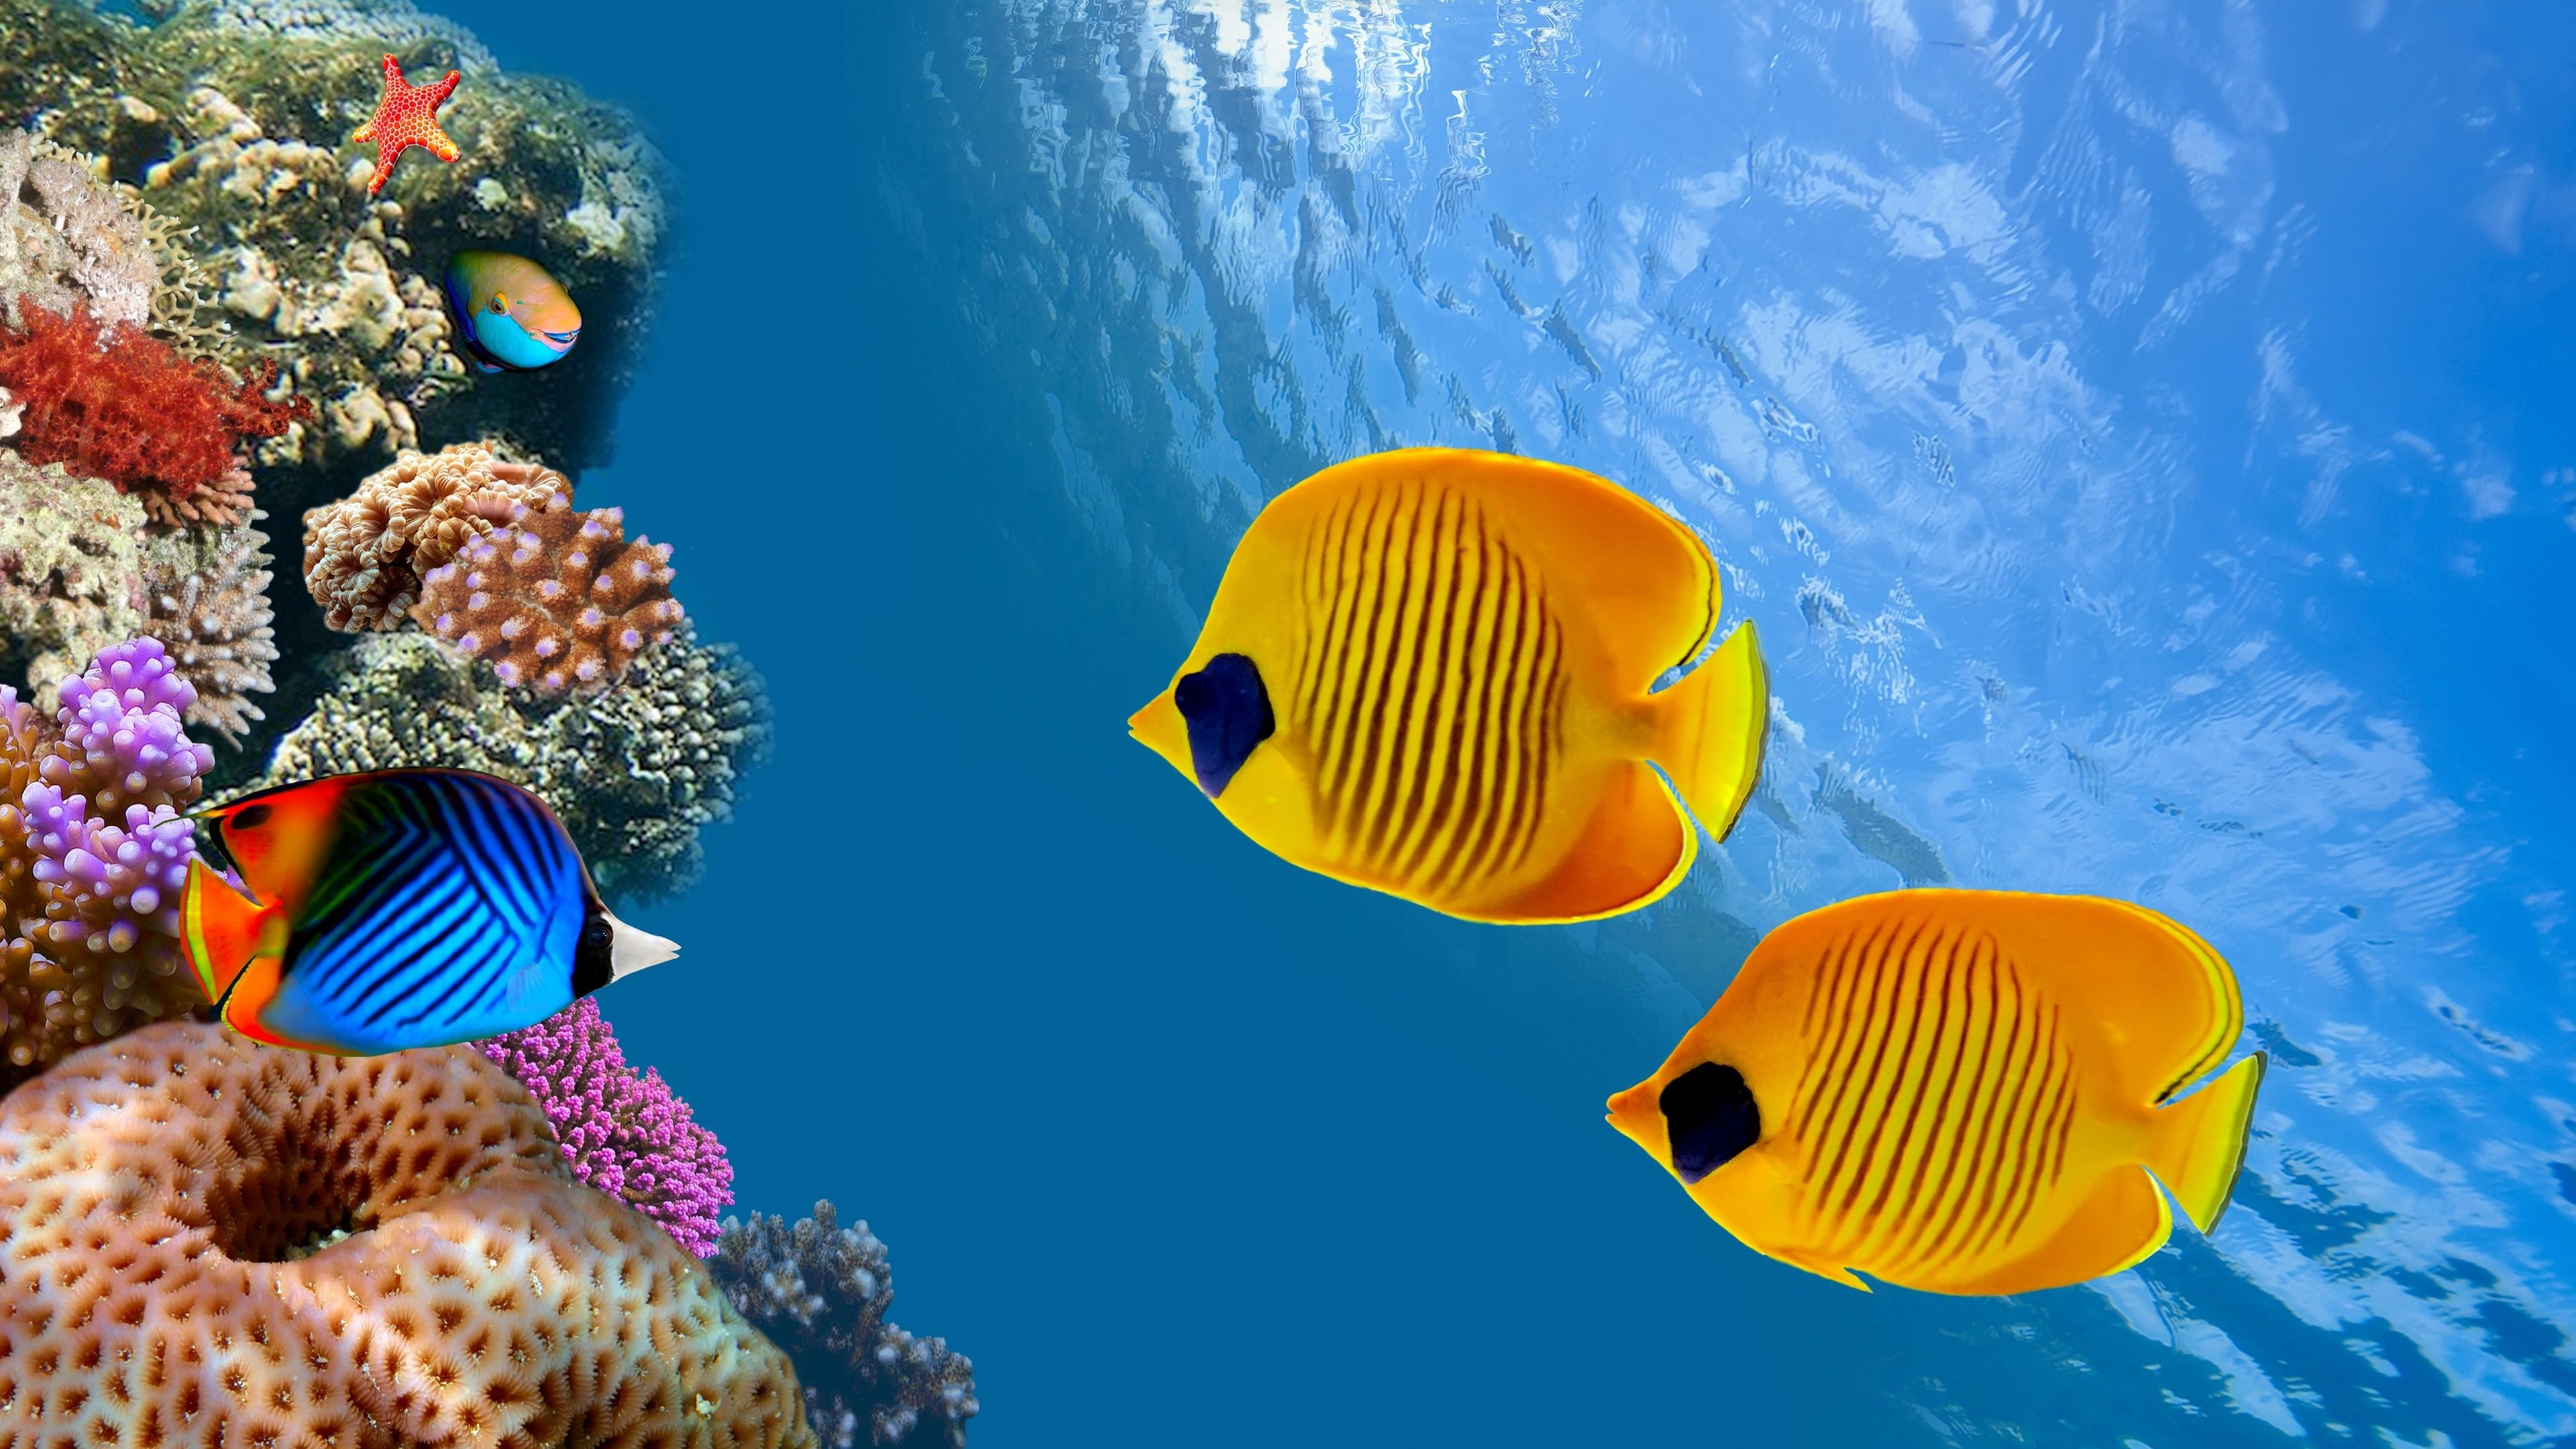 Underwater Sea Fish Underwater 4k Ultra Hd Wallpaper 4k